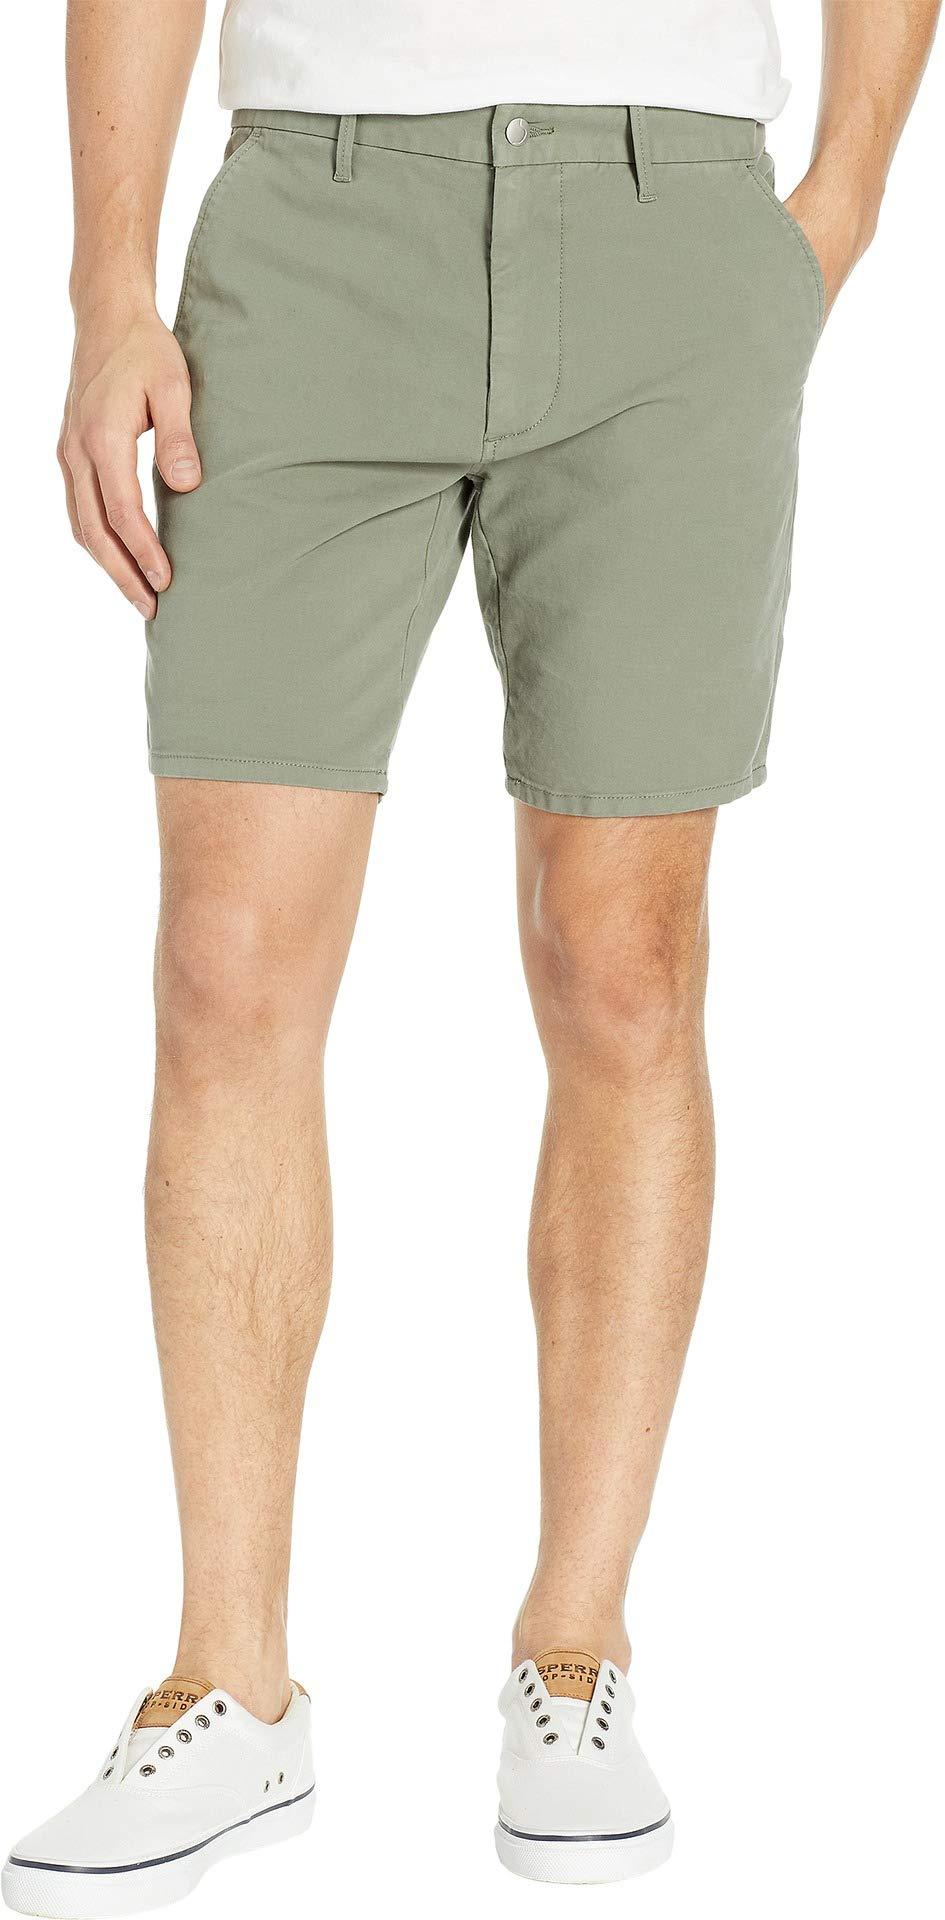 Joe's Jeans Men's The Kinetic Brixton Trouser Short, Cactus, 31